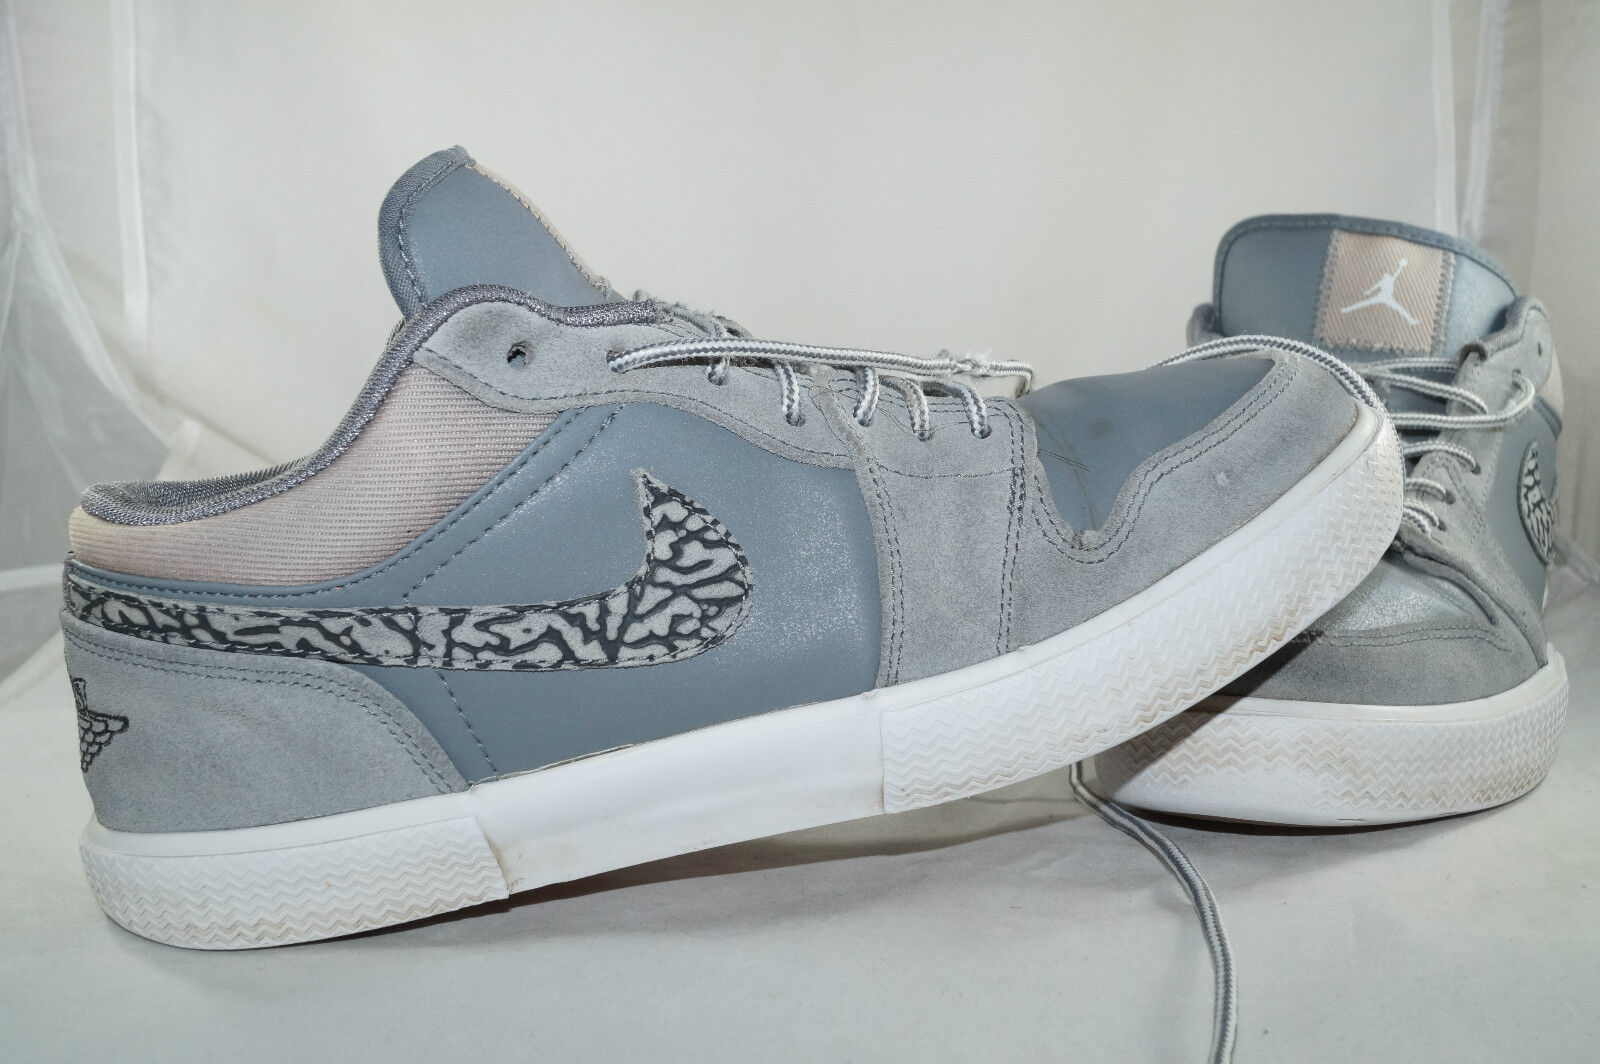 Nike Air Jordan RETRO V.I Gr: 44 Grau Basketball Low Tops